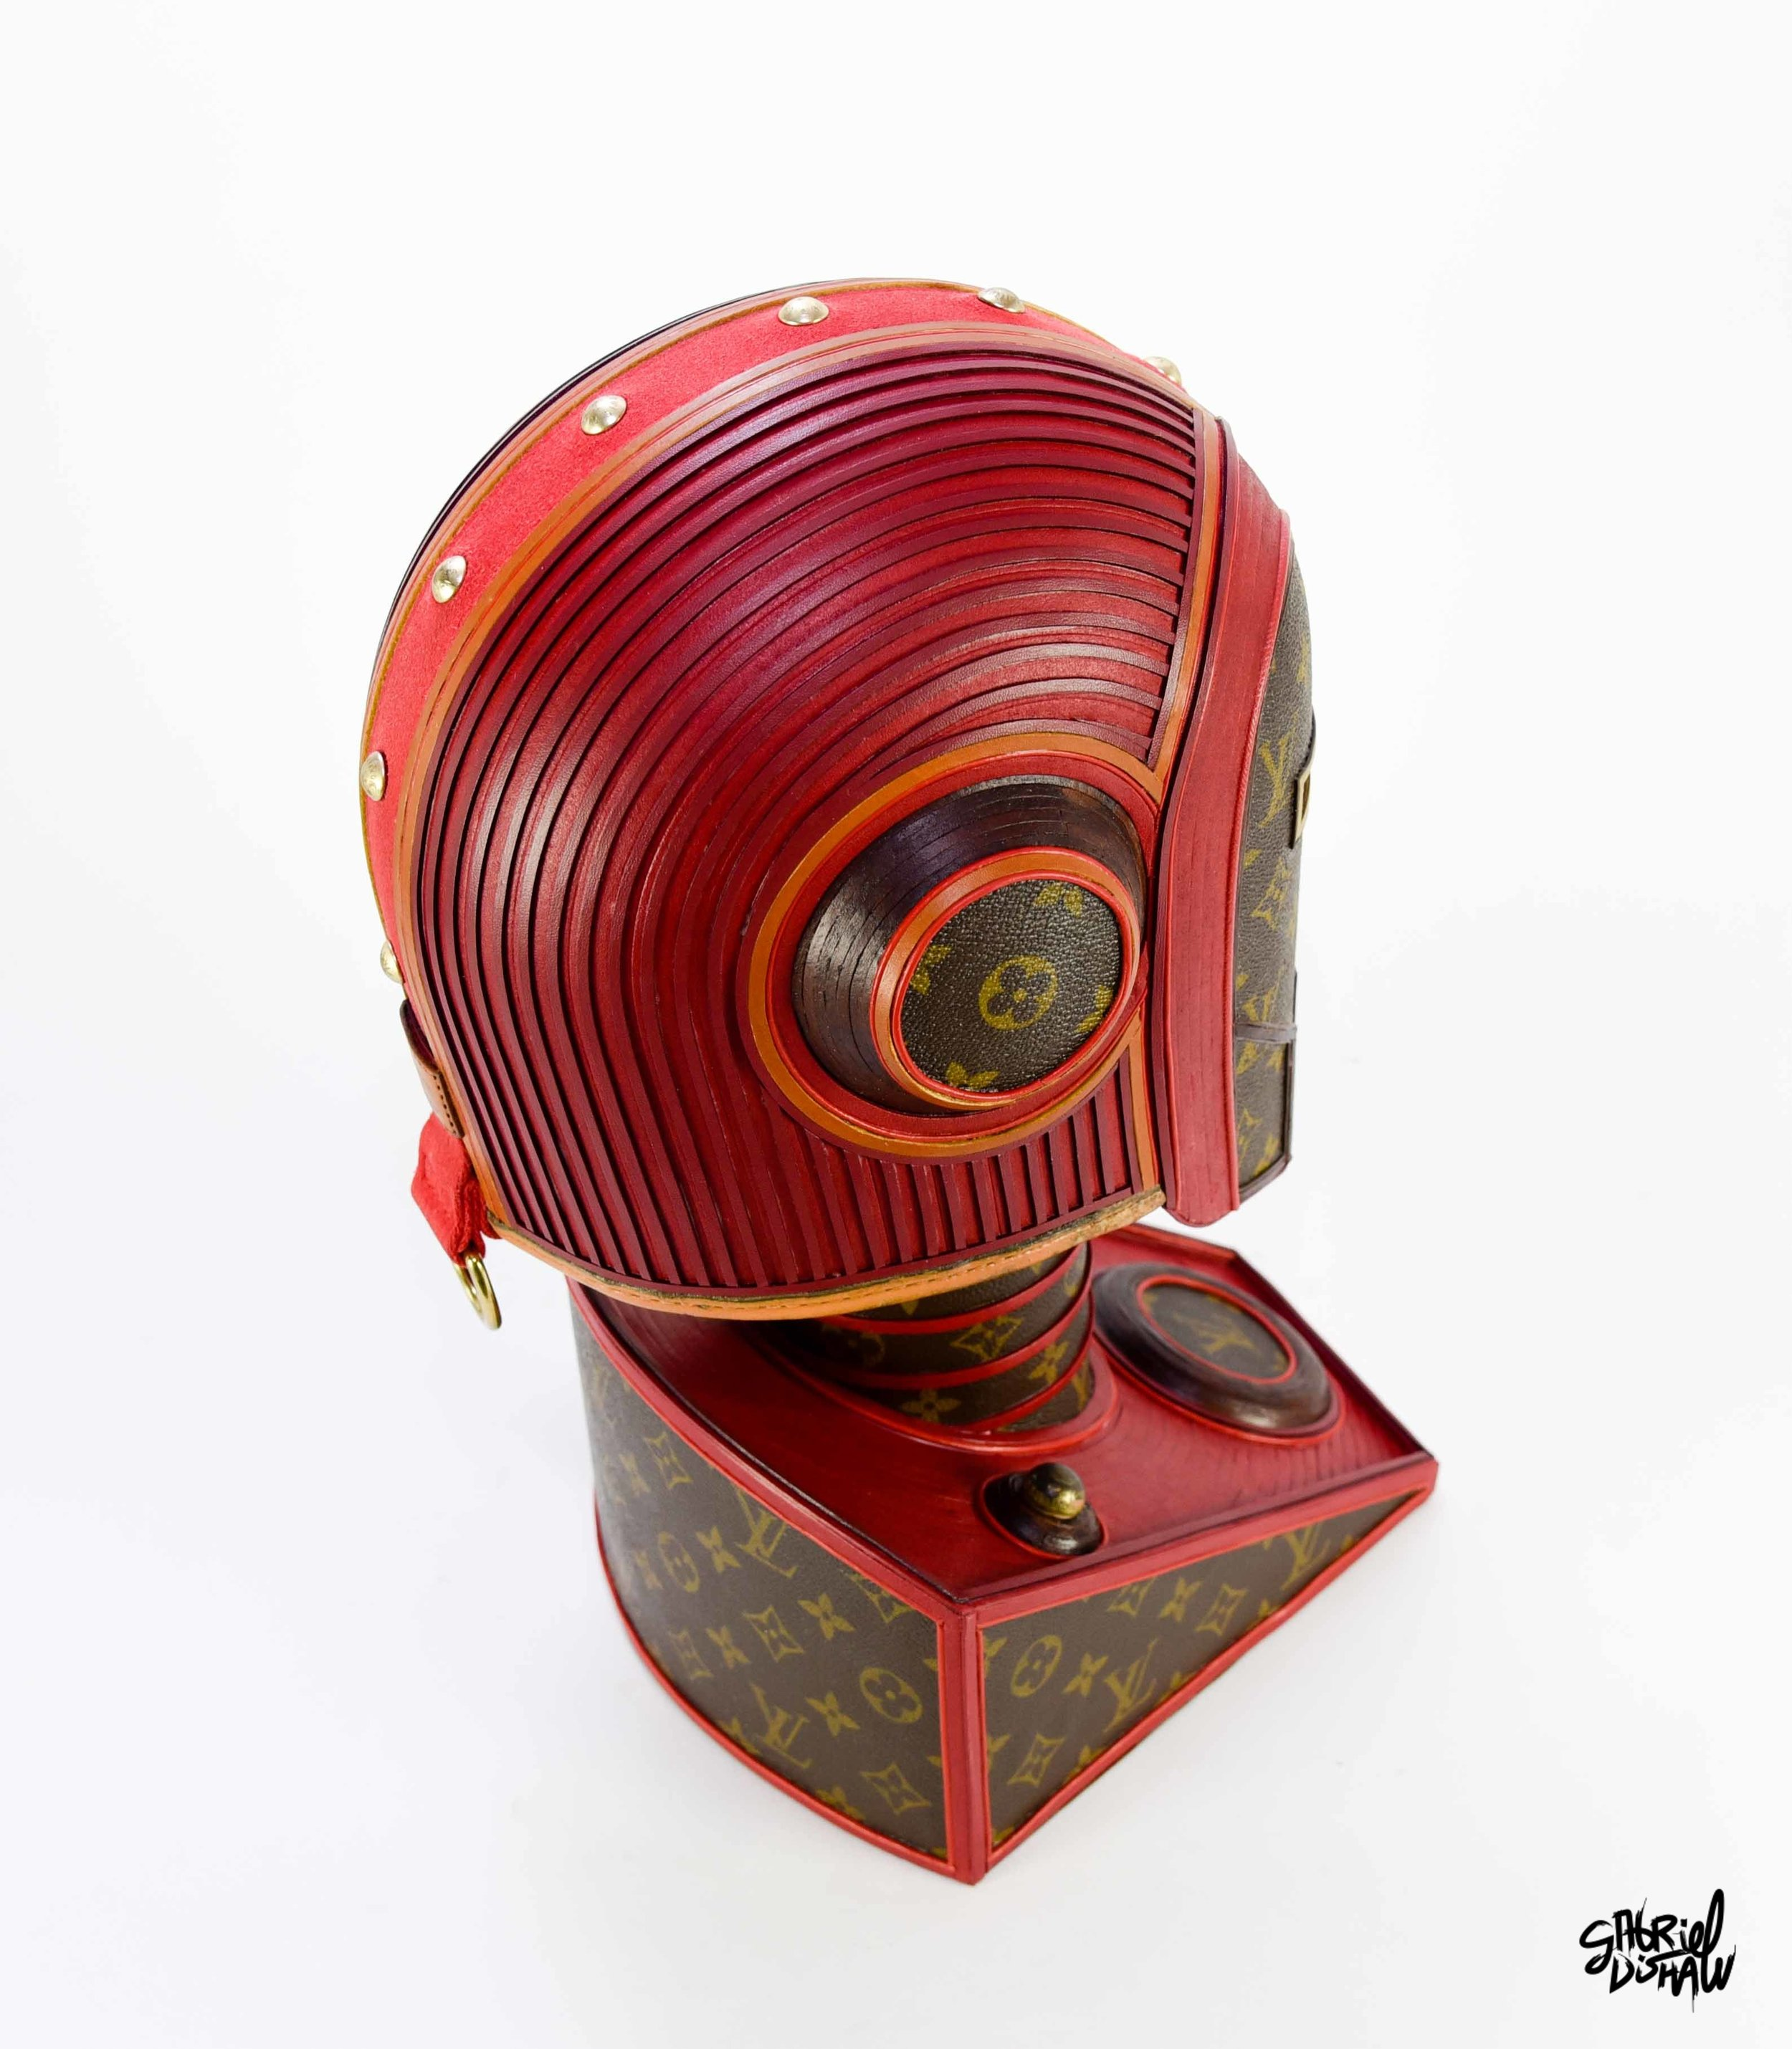 Gabriel Dishaw Vintage Iron Man LV-0087.jpg